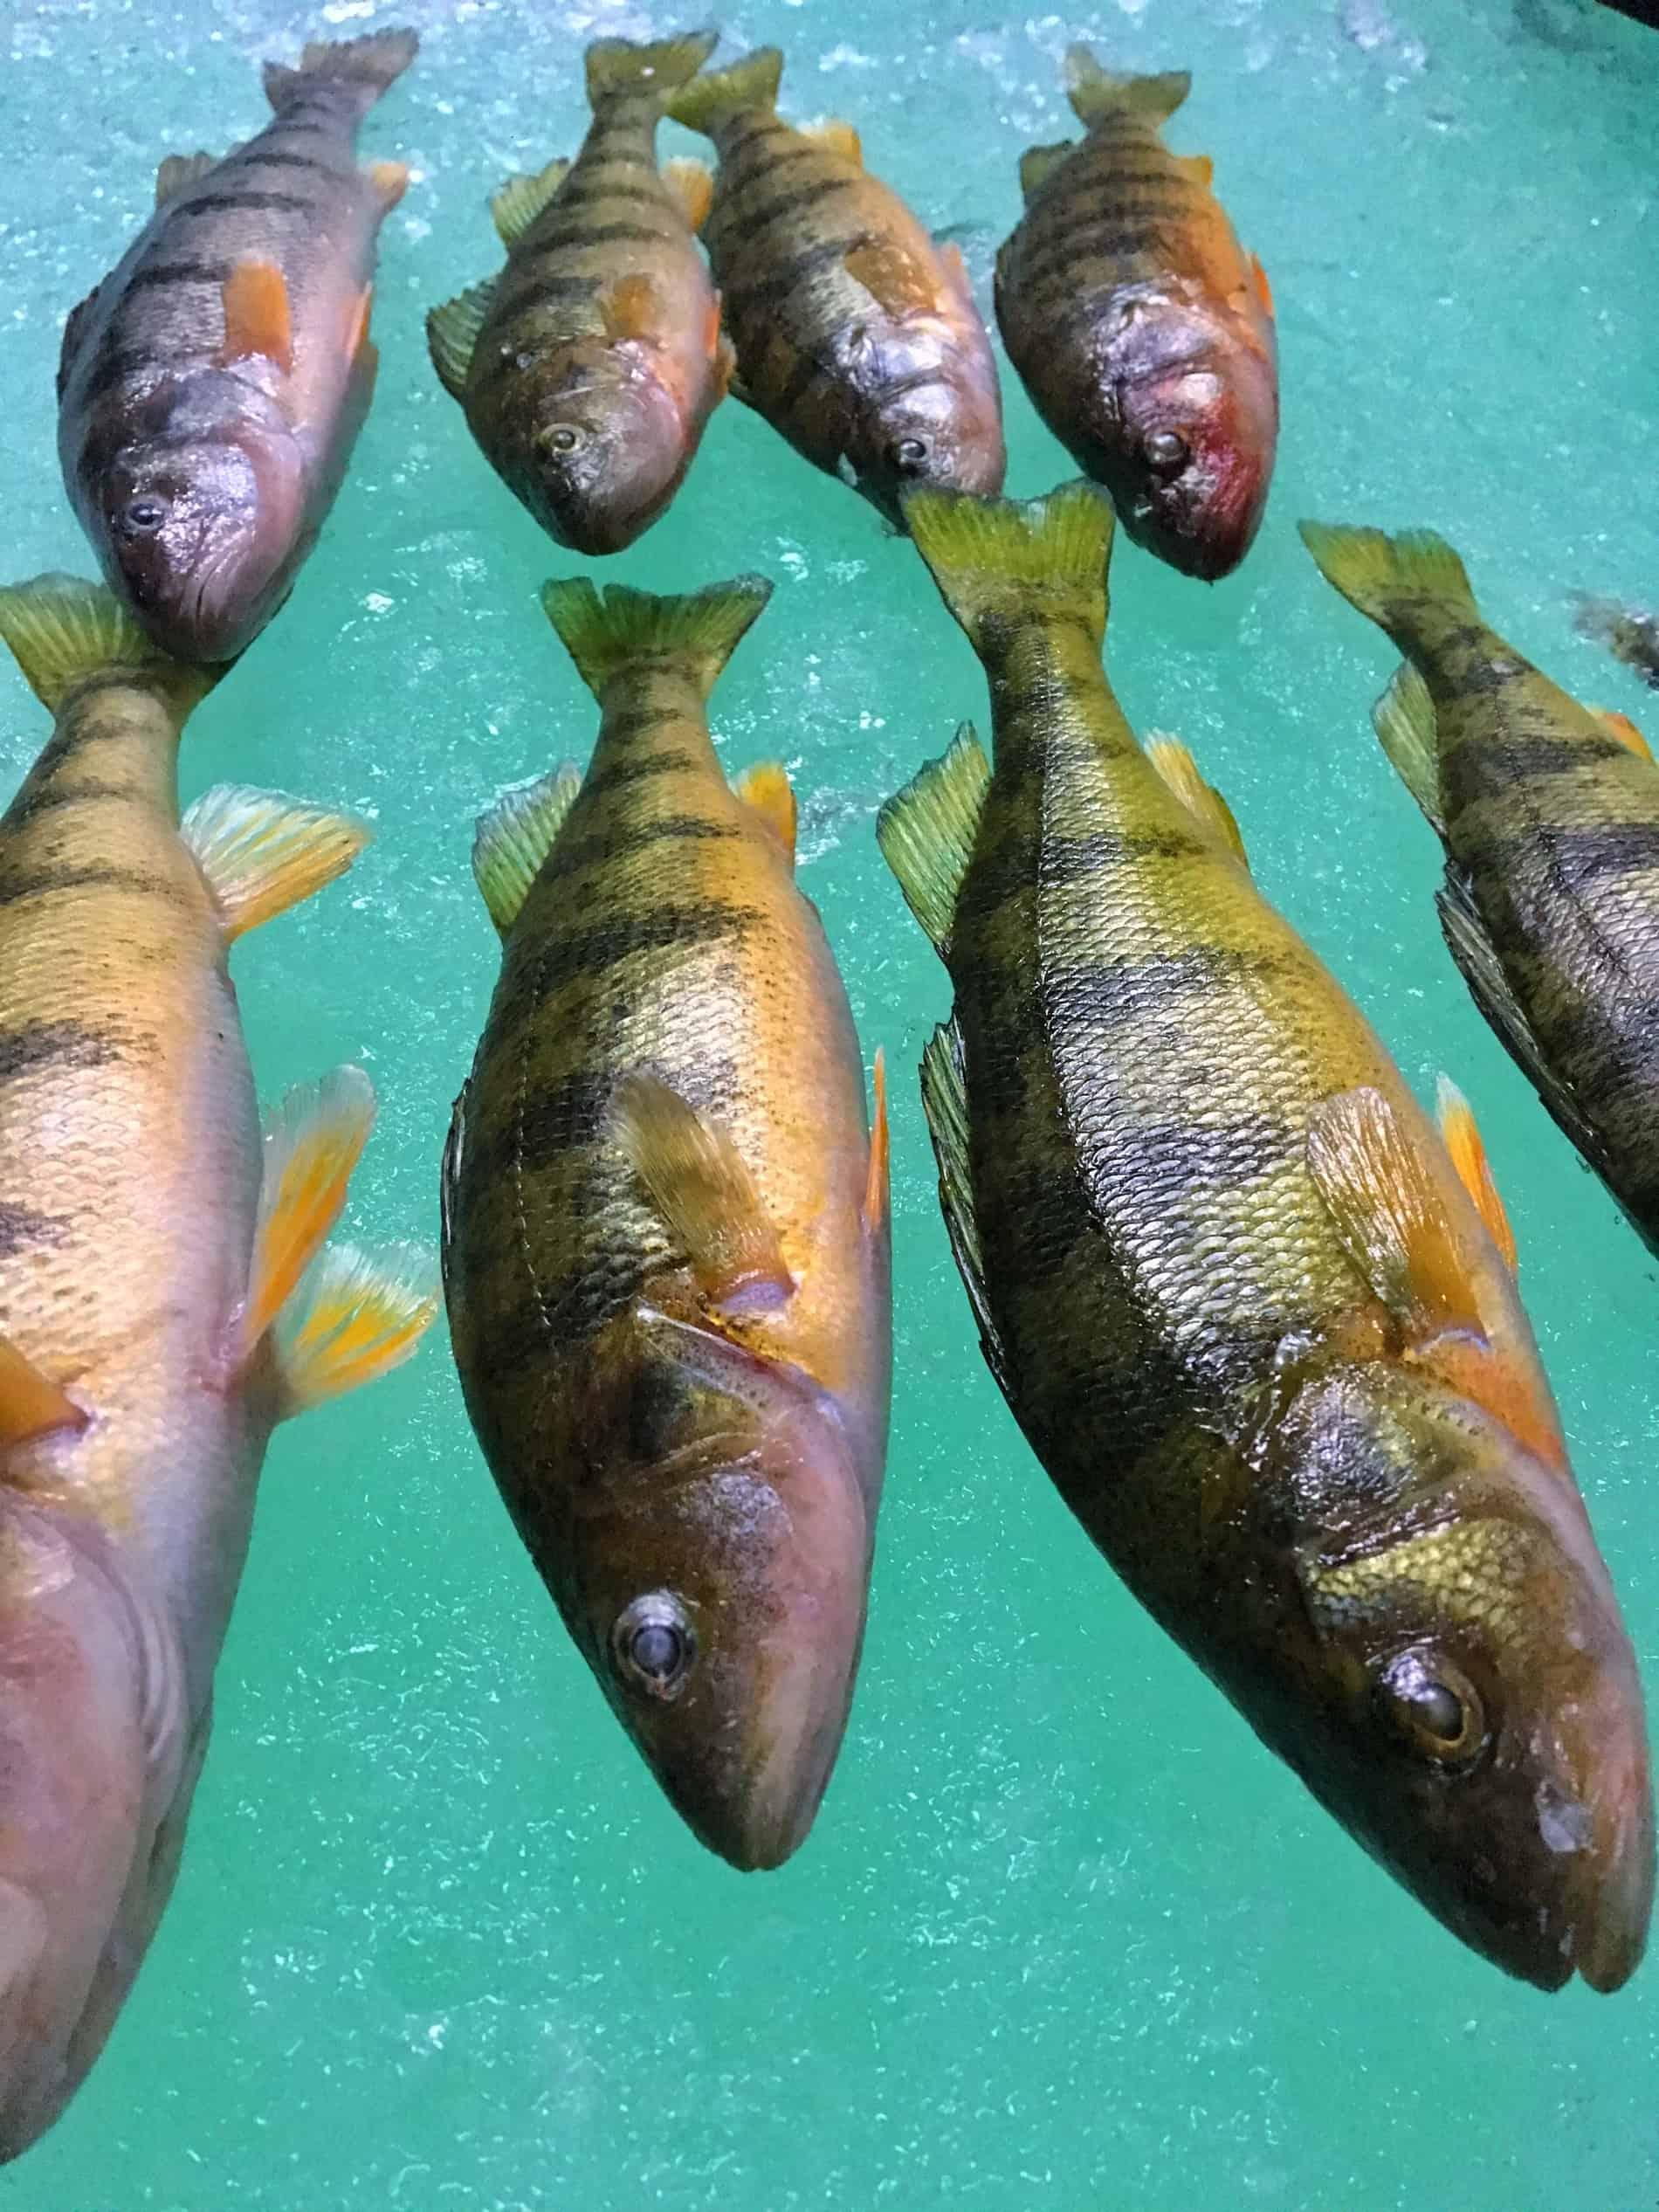 Jumbo perch with yellow bellies